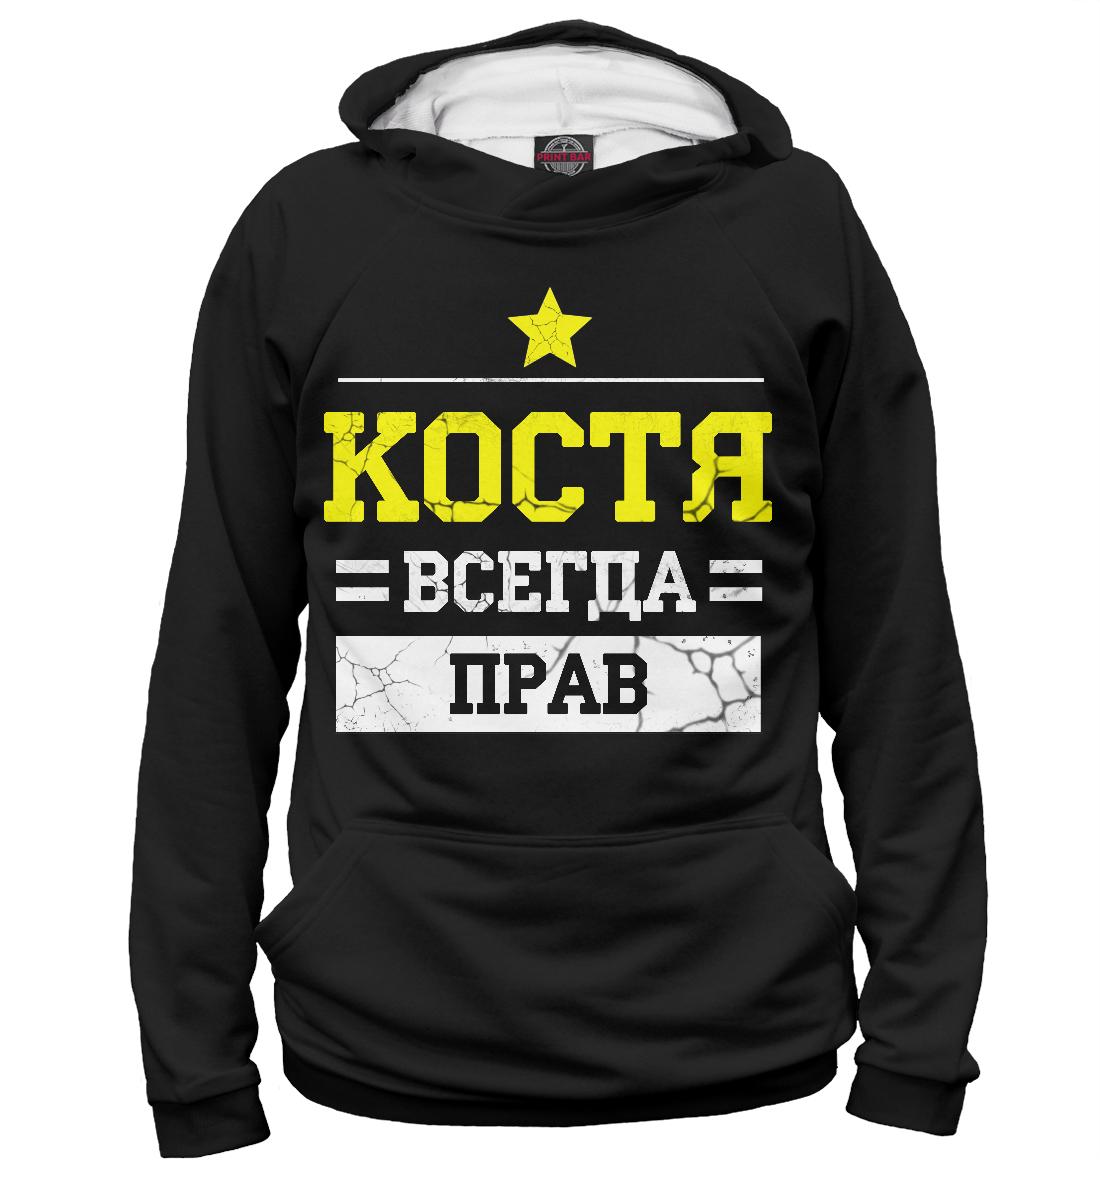 Купить Костя, Printbar, Худи, KST-182303-hud-1